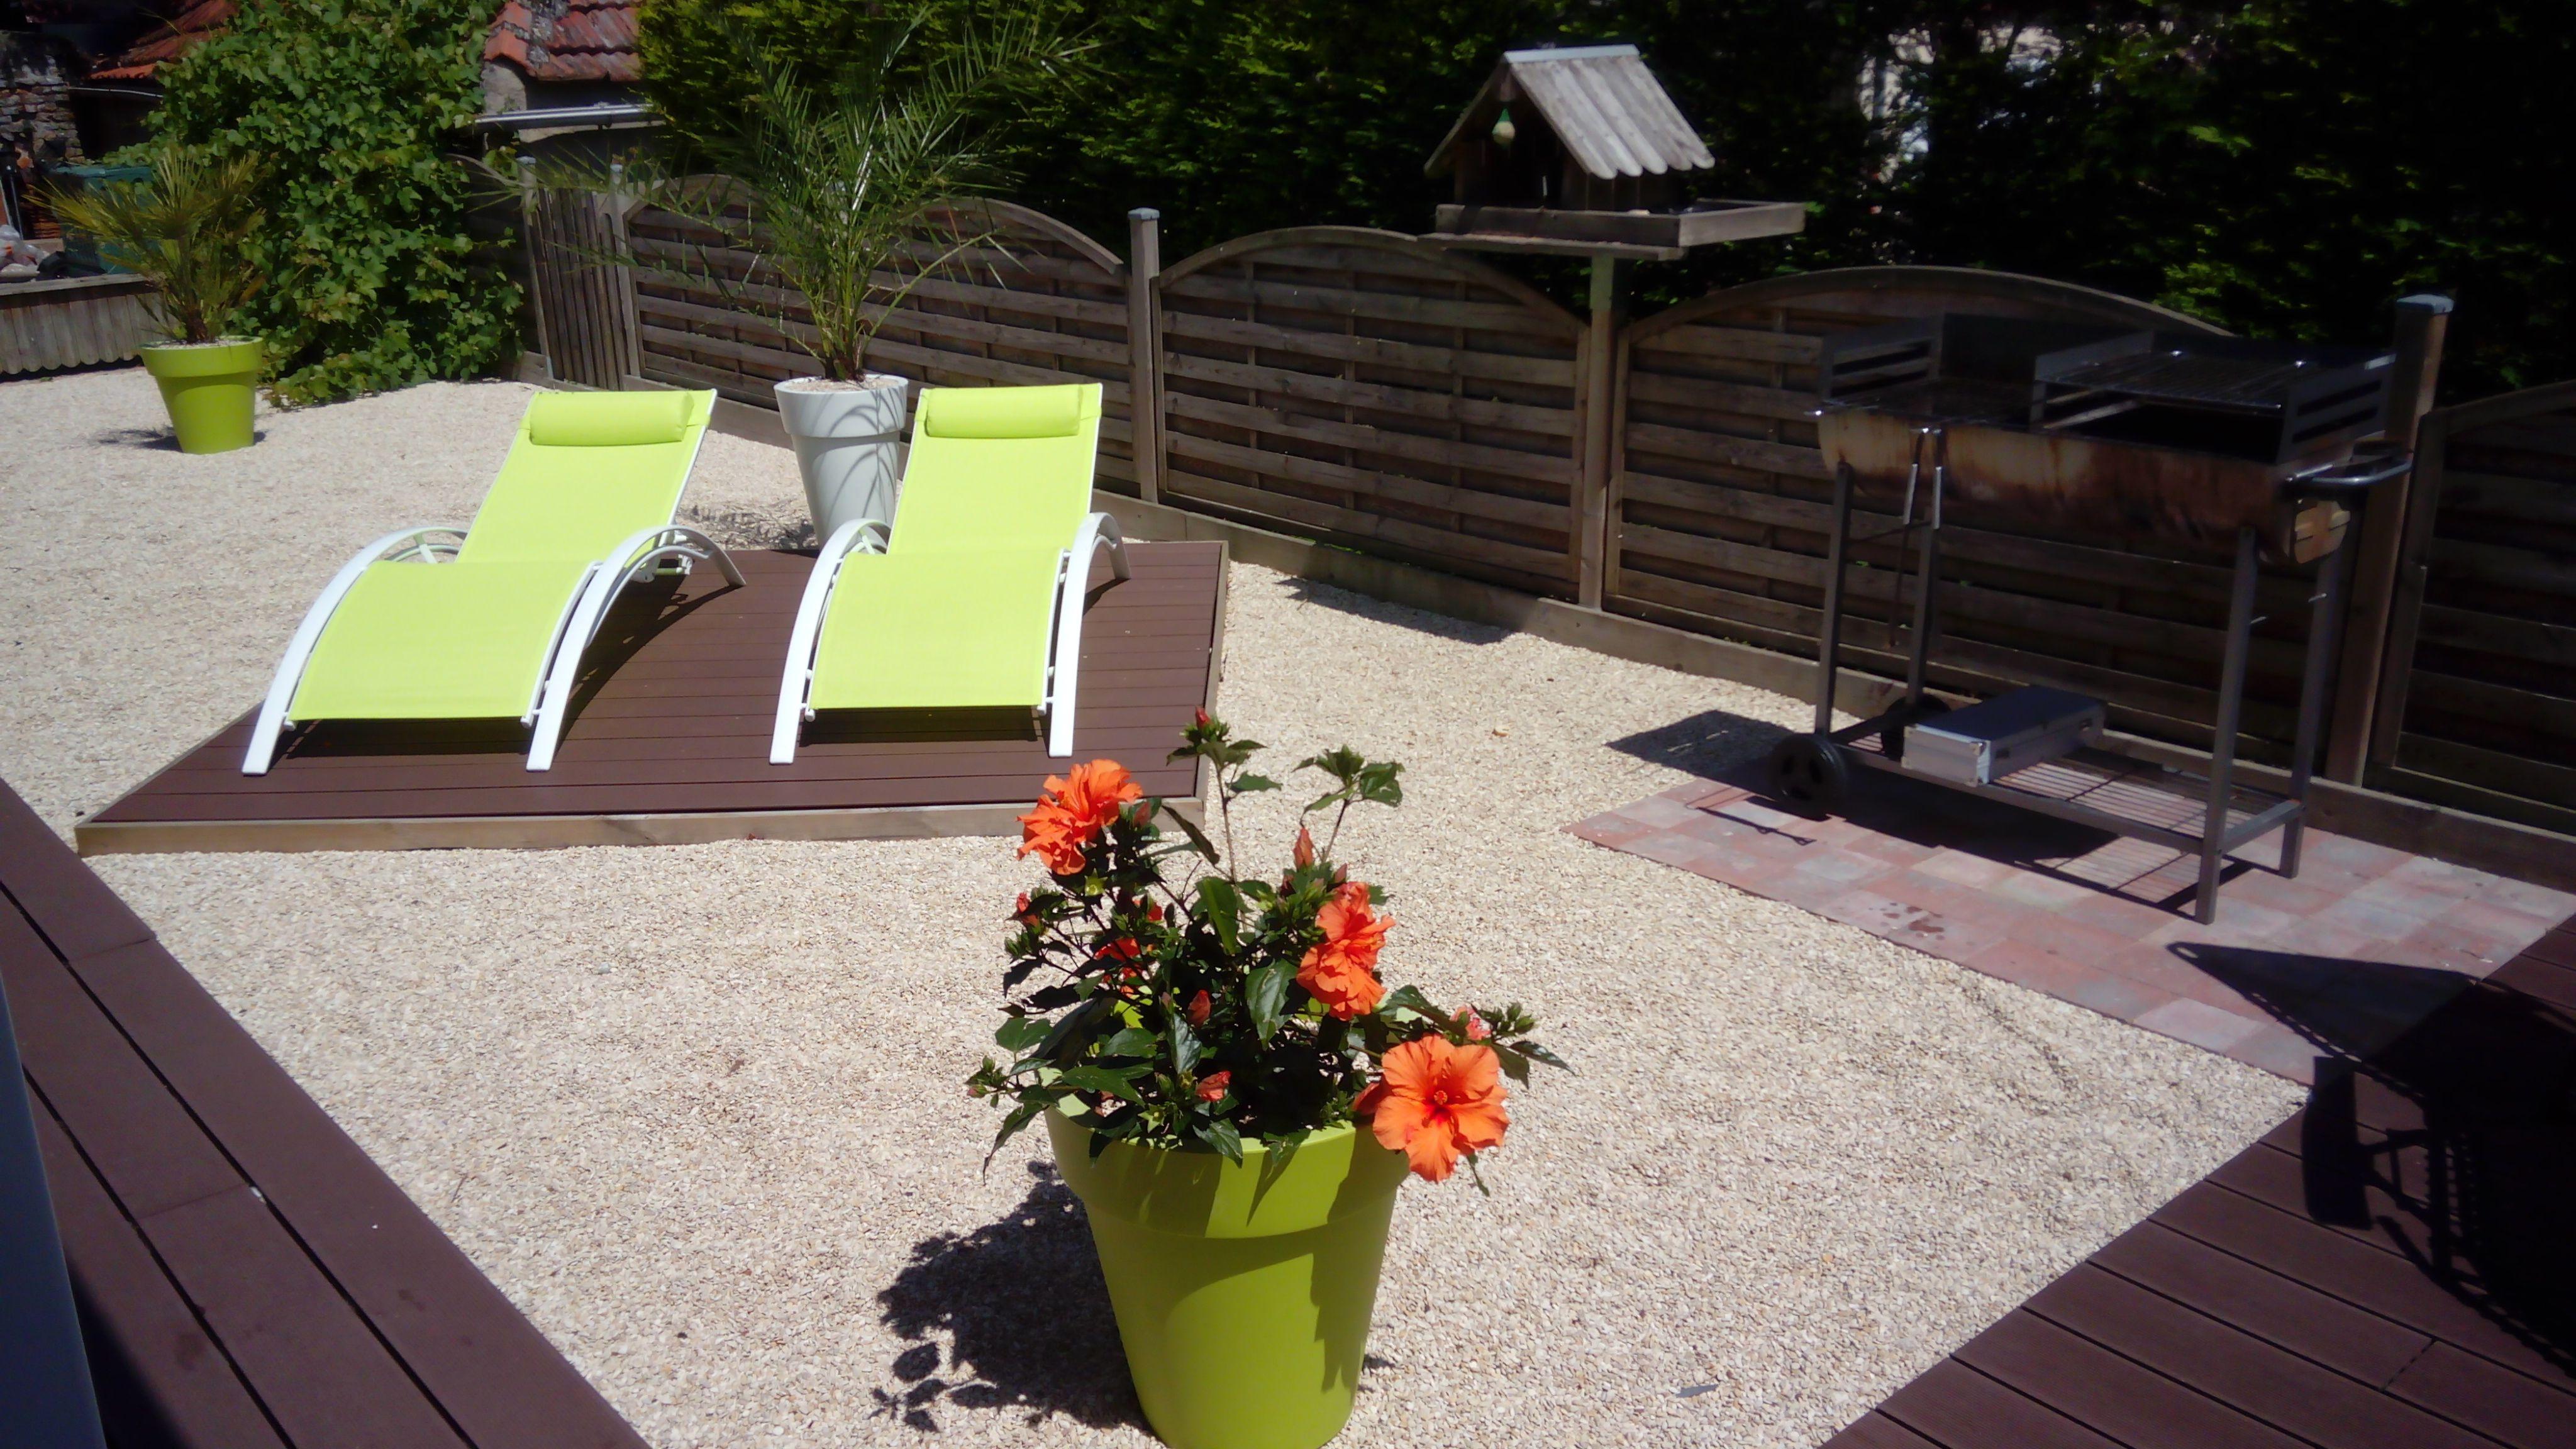 louisa duo de bains de soleil en aluminium et textil ne alice 39 s garden transat jardin transat. Black Bedroom Furniture Sets. Home Design Ideas